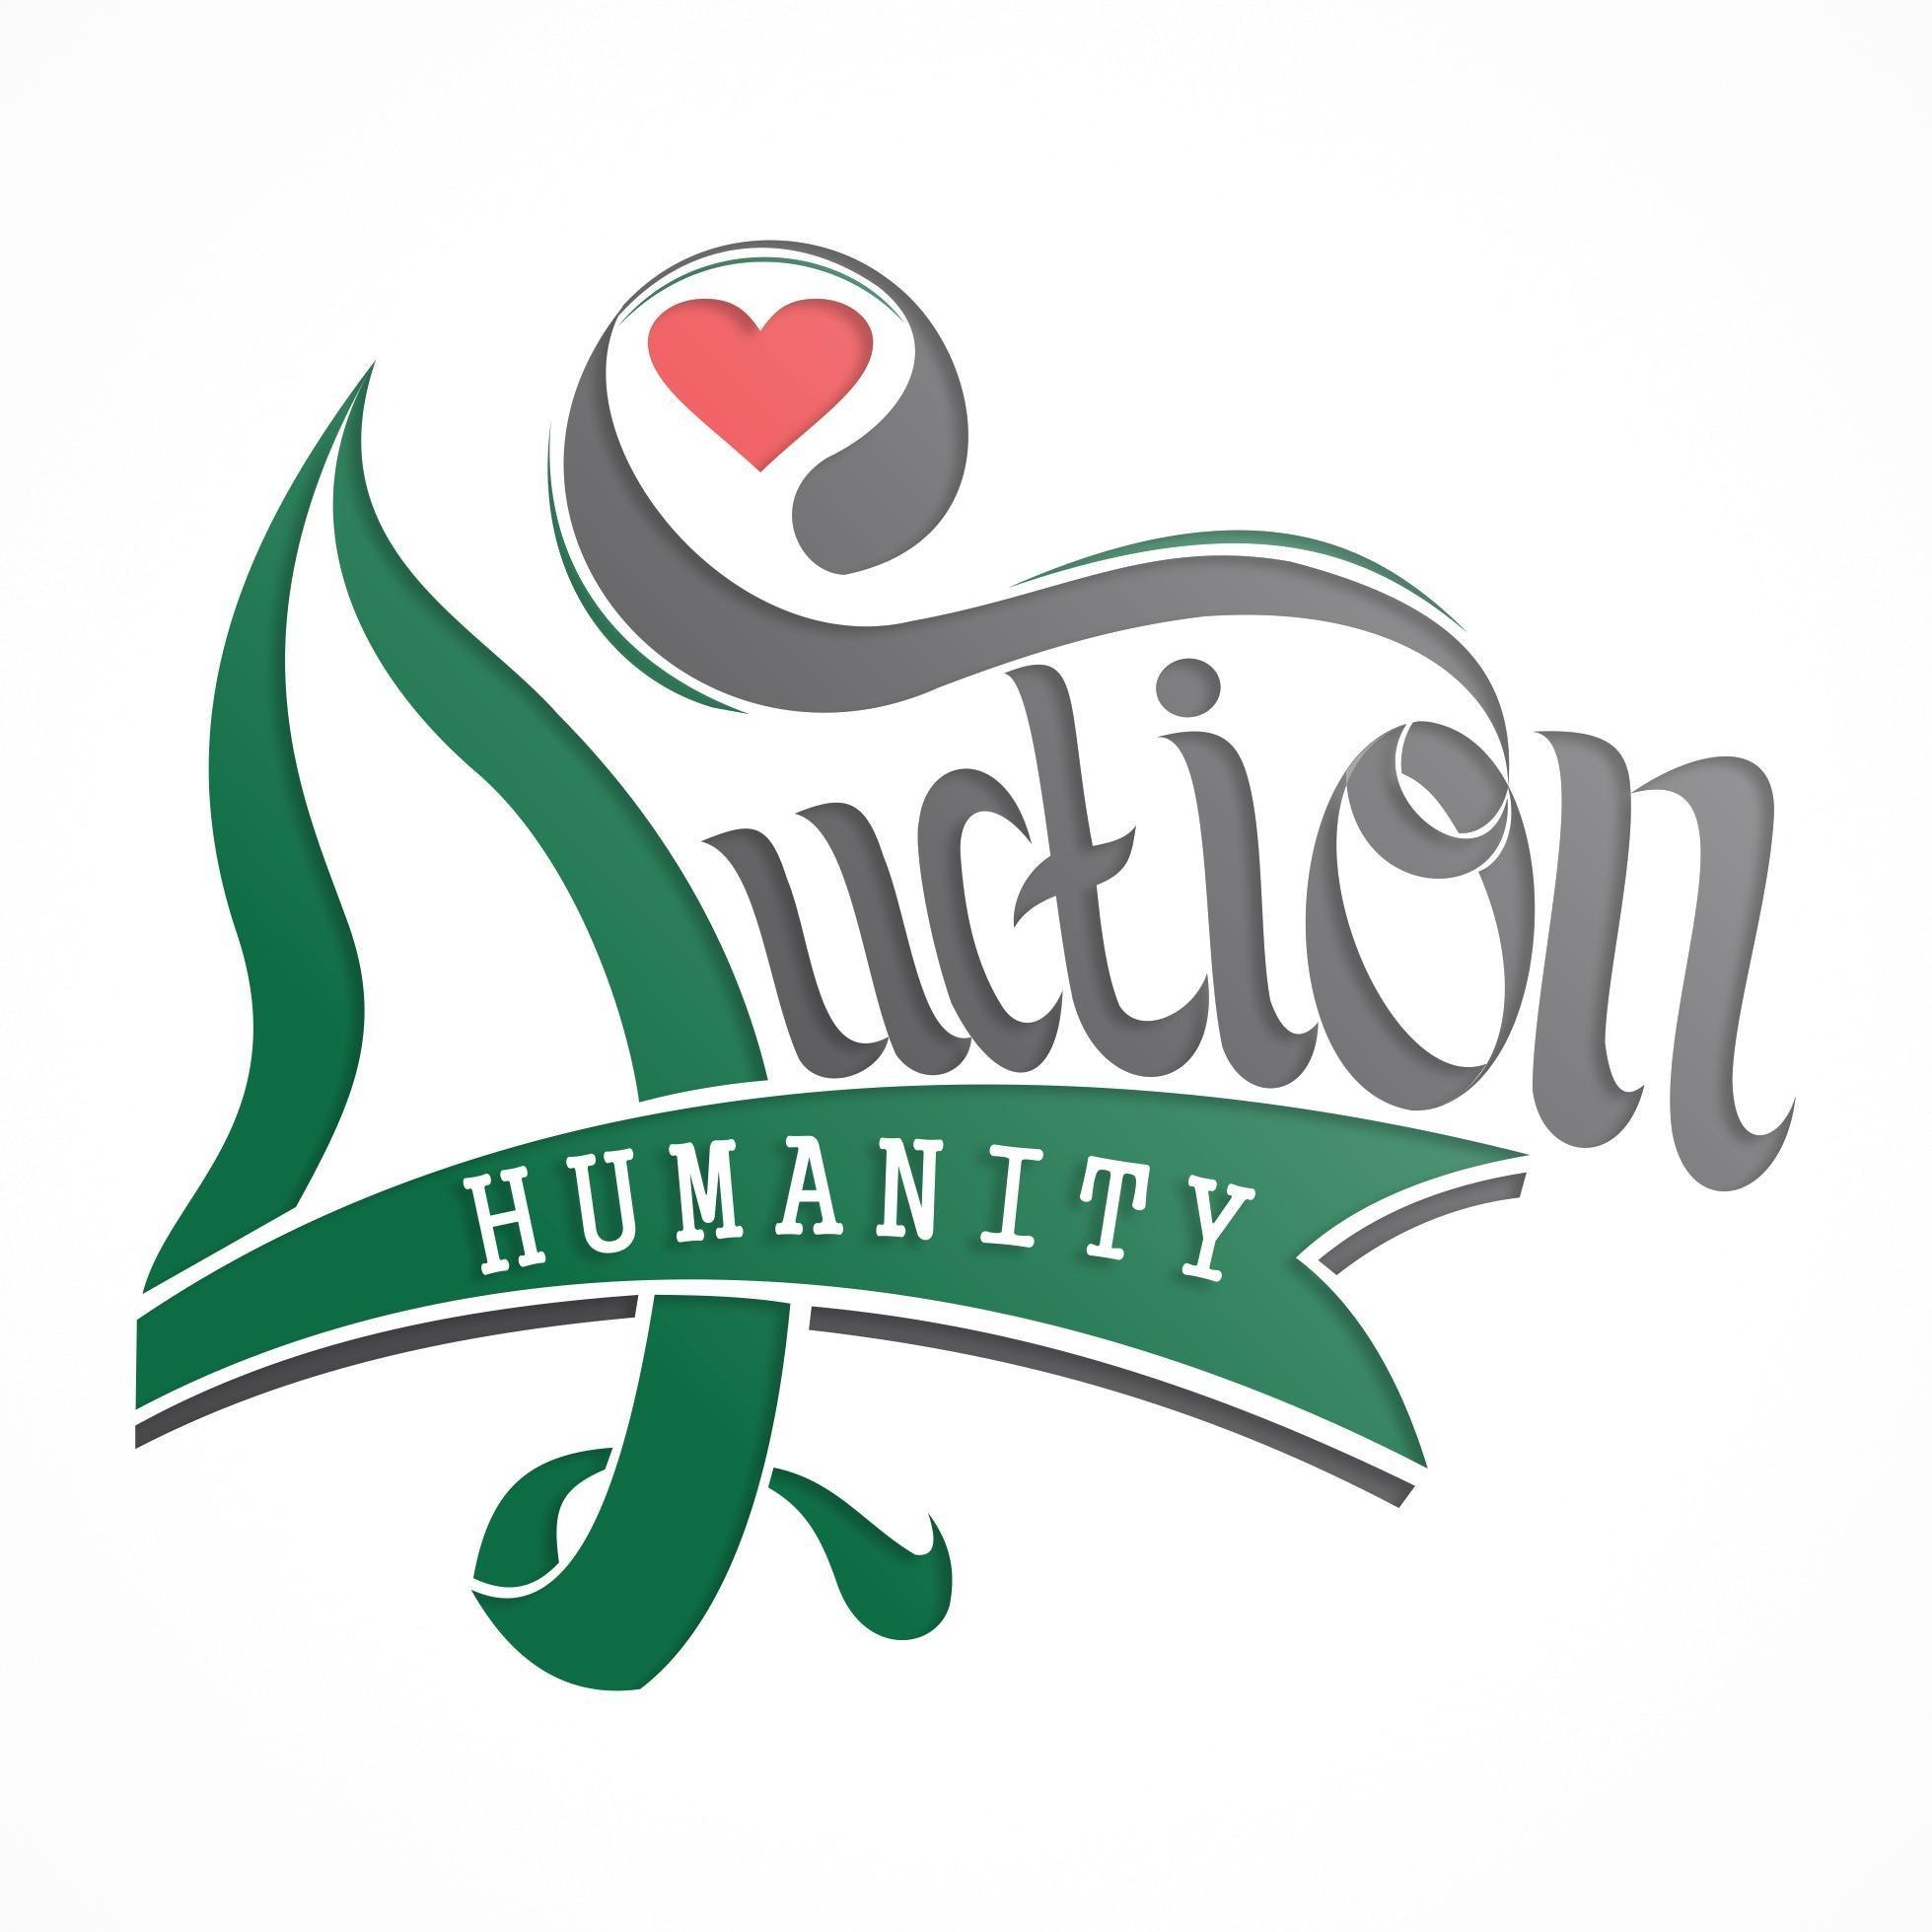 Auction4Humanity Kunjungi Para Pengungsi VOA ISLAM